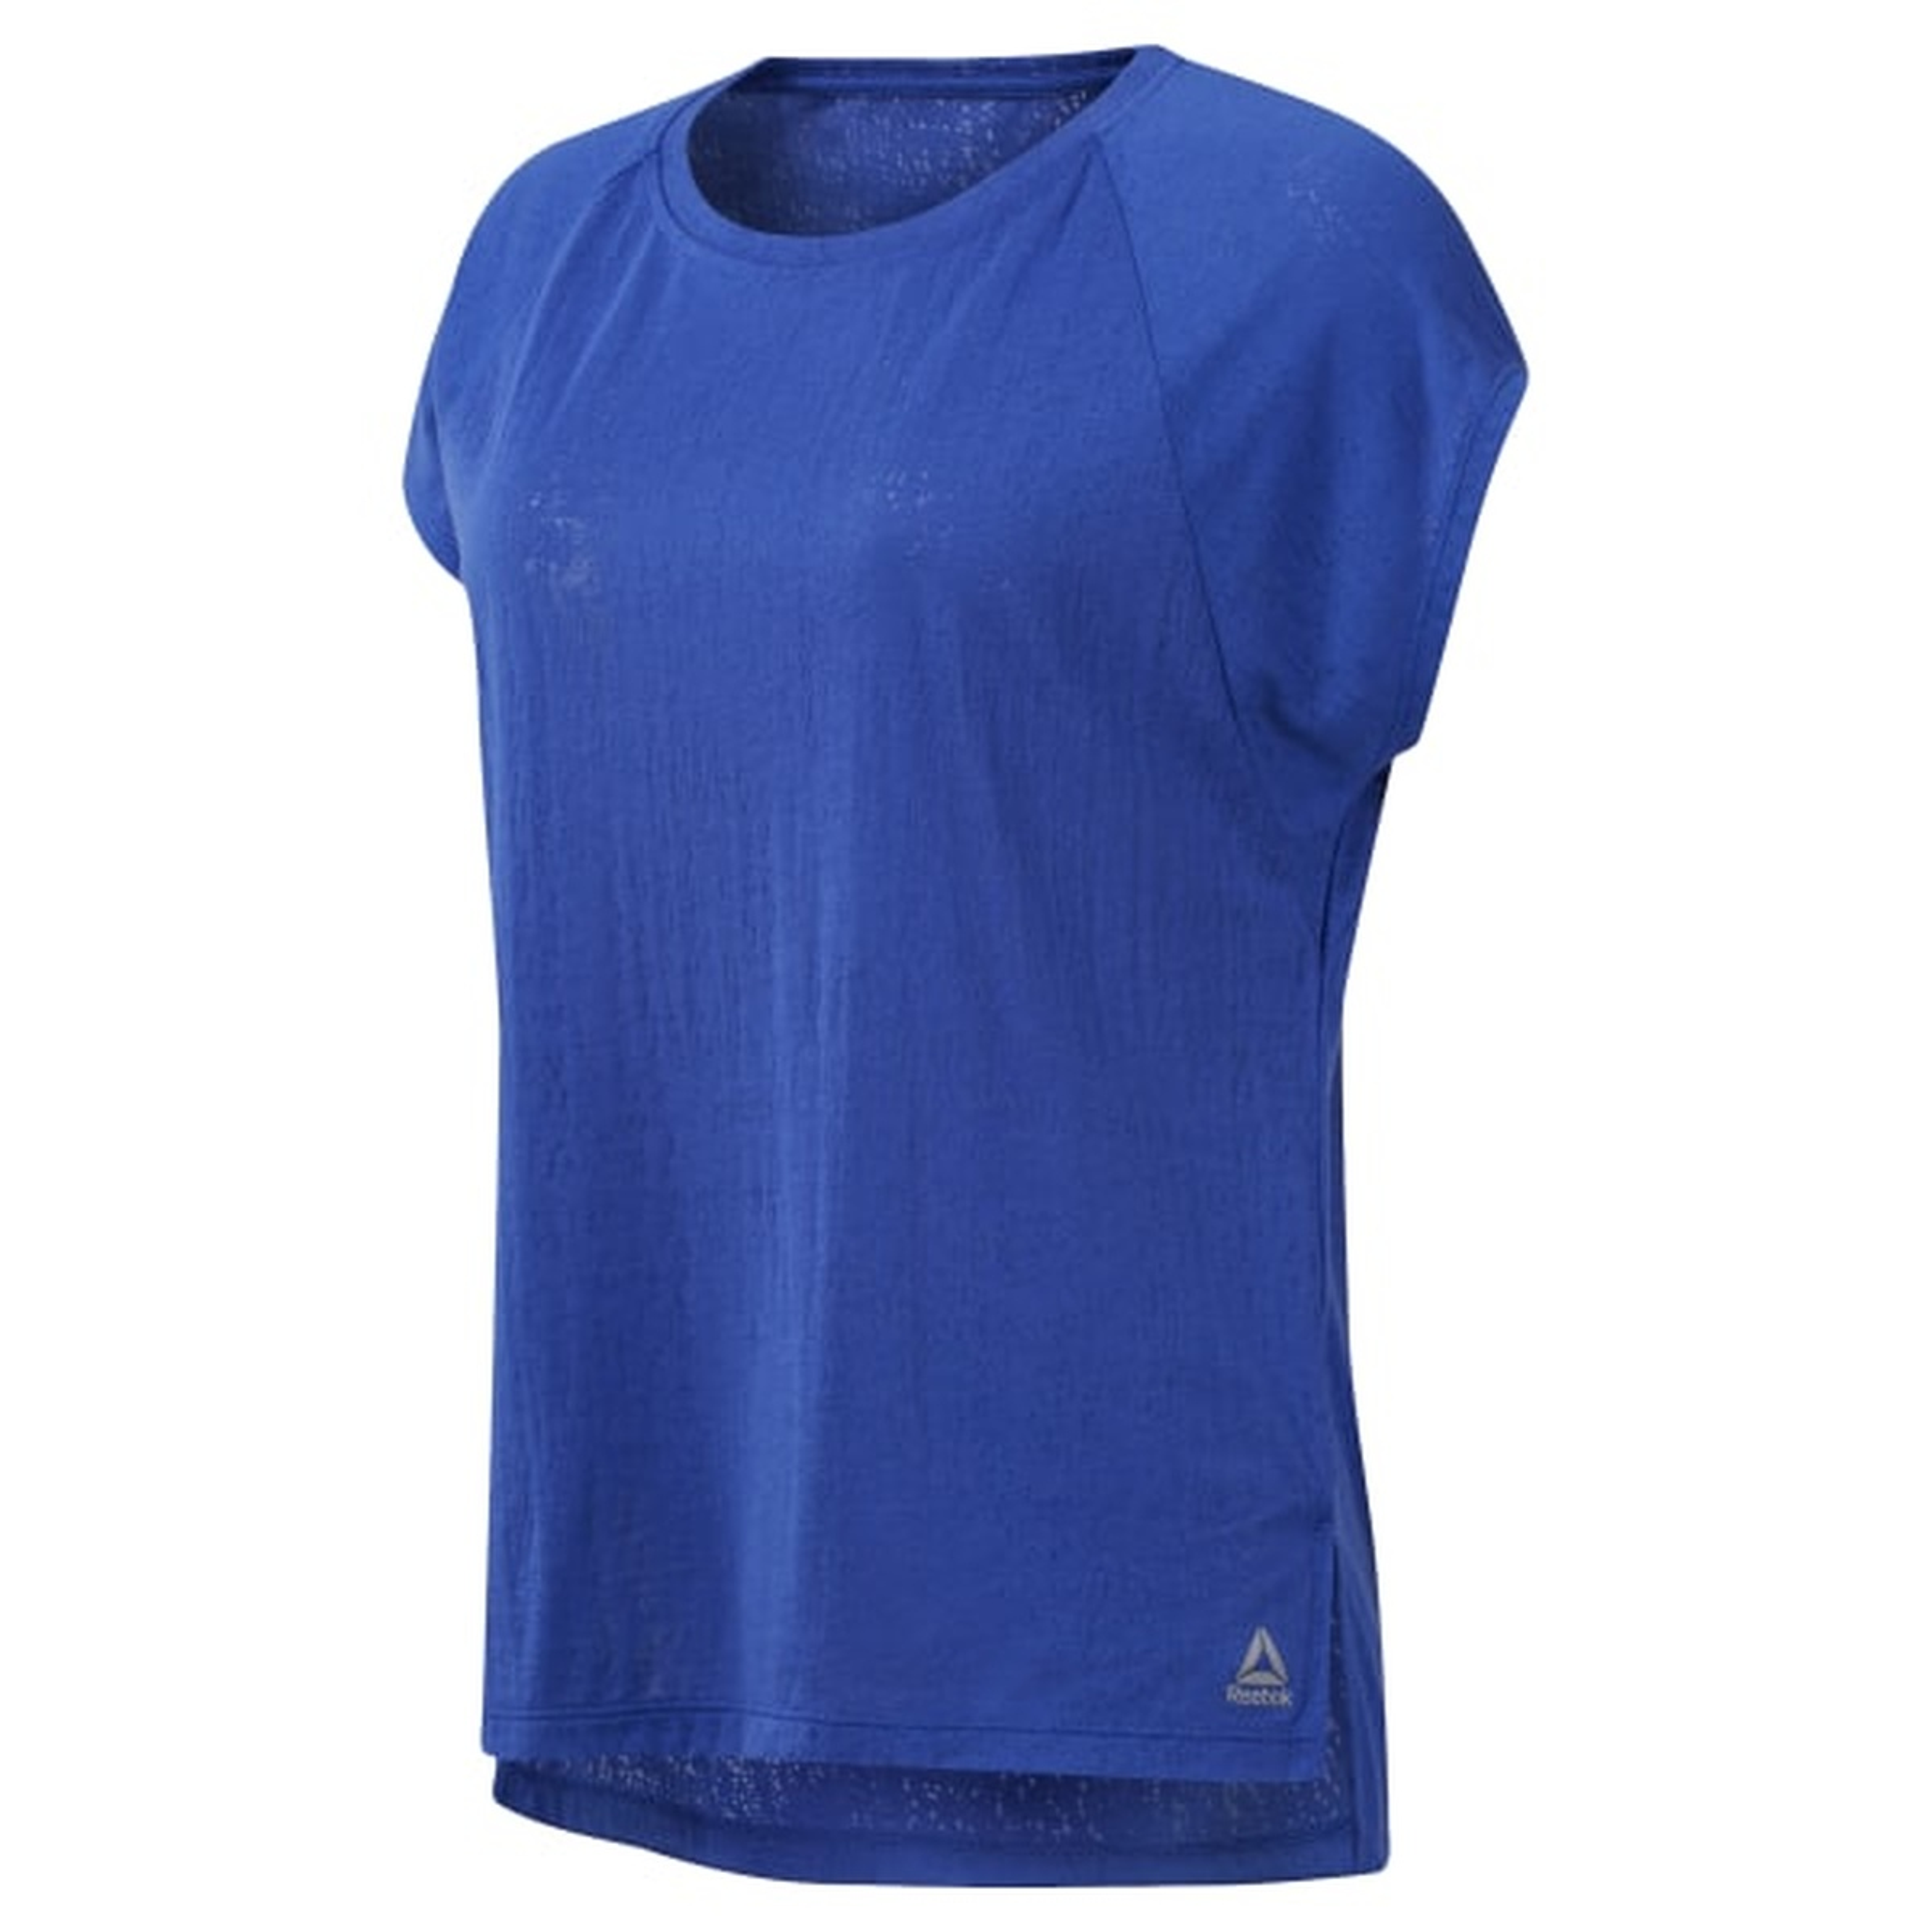 88b37a78c1a Reebok Os Shirt - Shirts - Fitnesskleding - Fitness - Intersport van ...